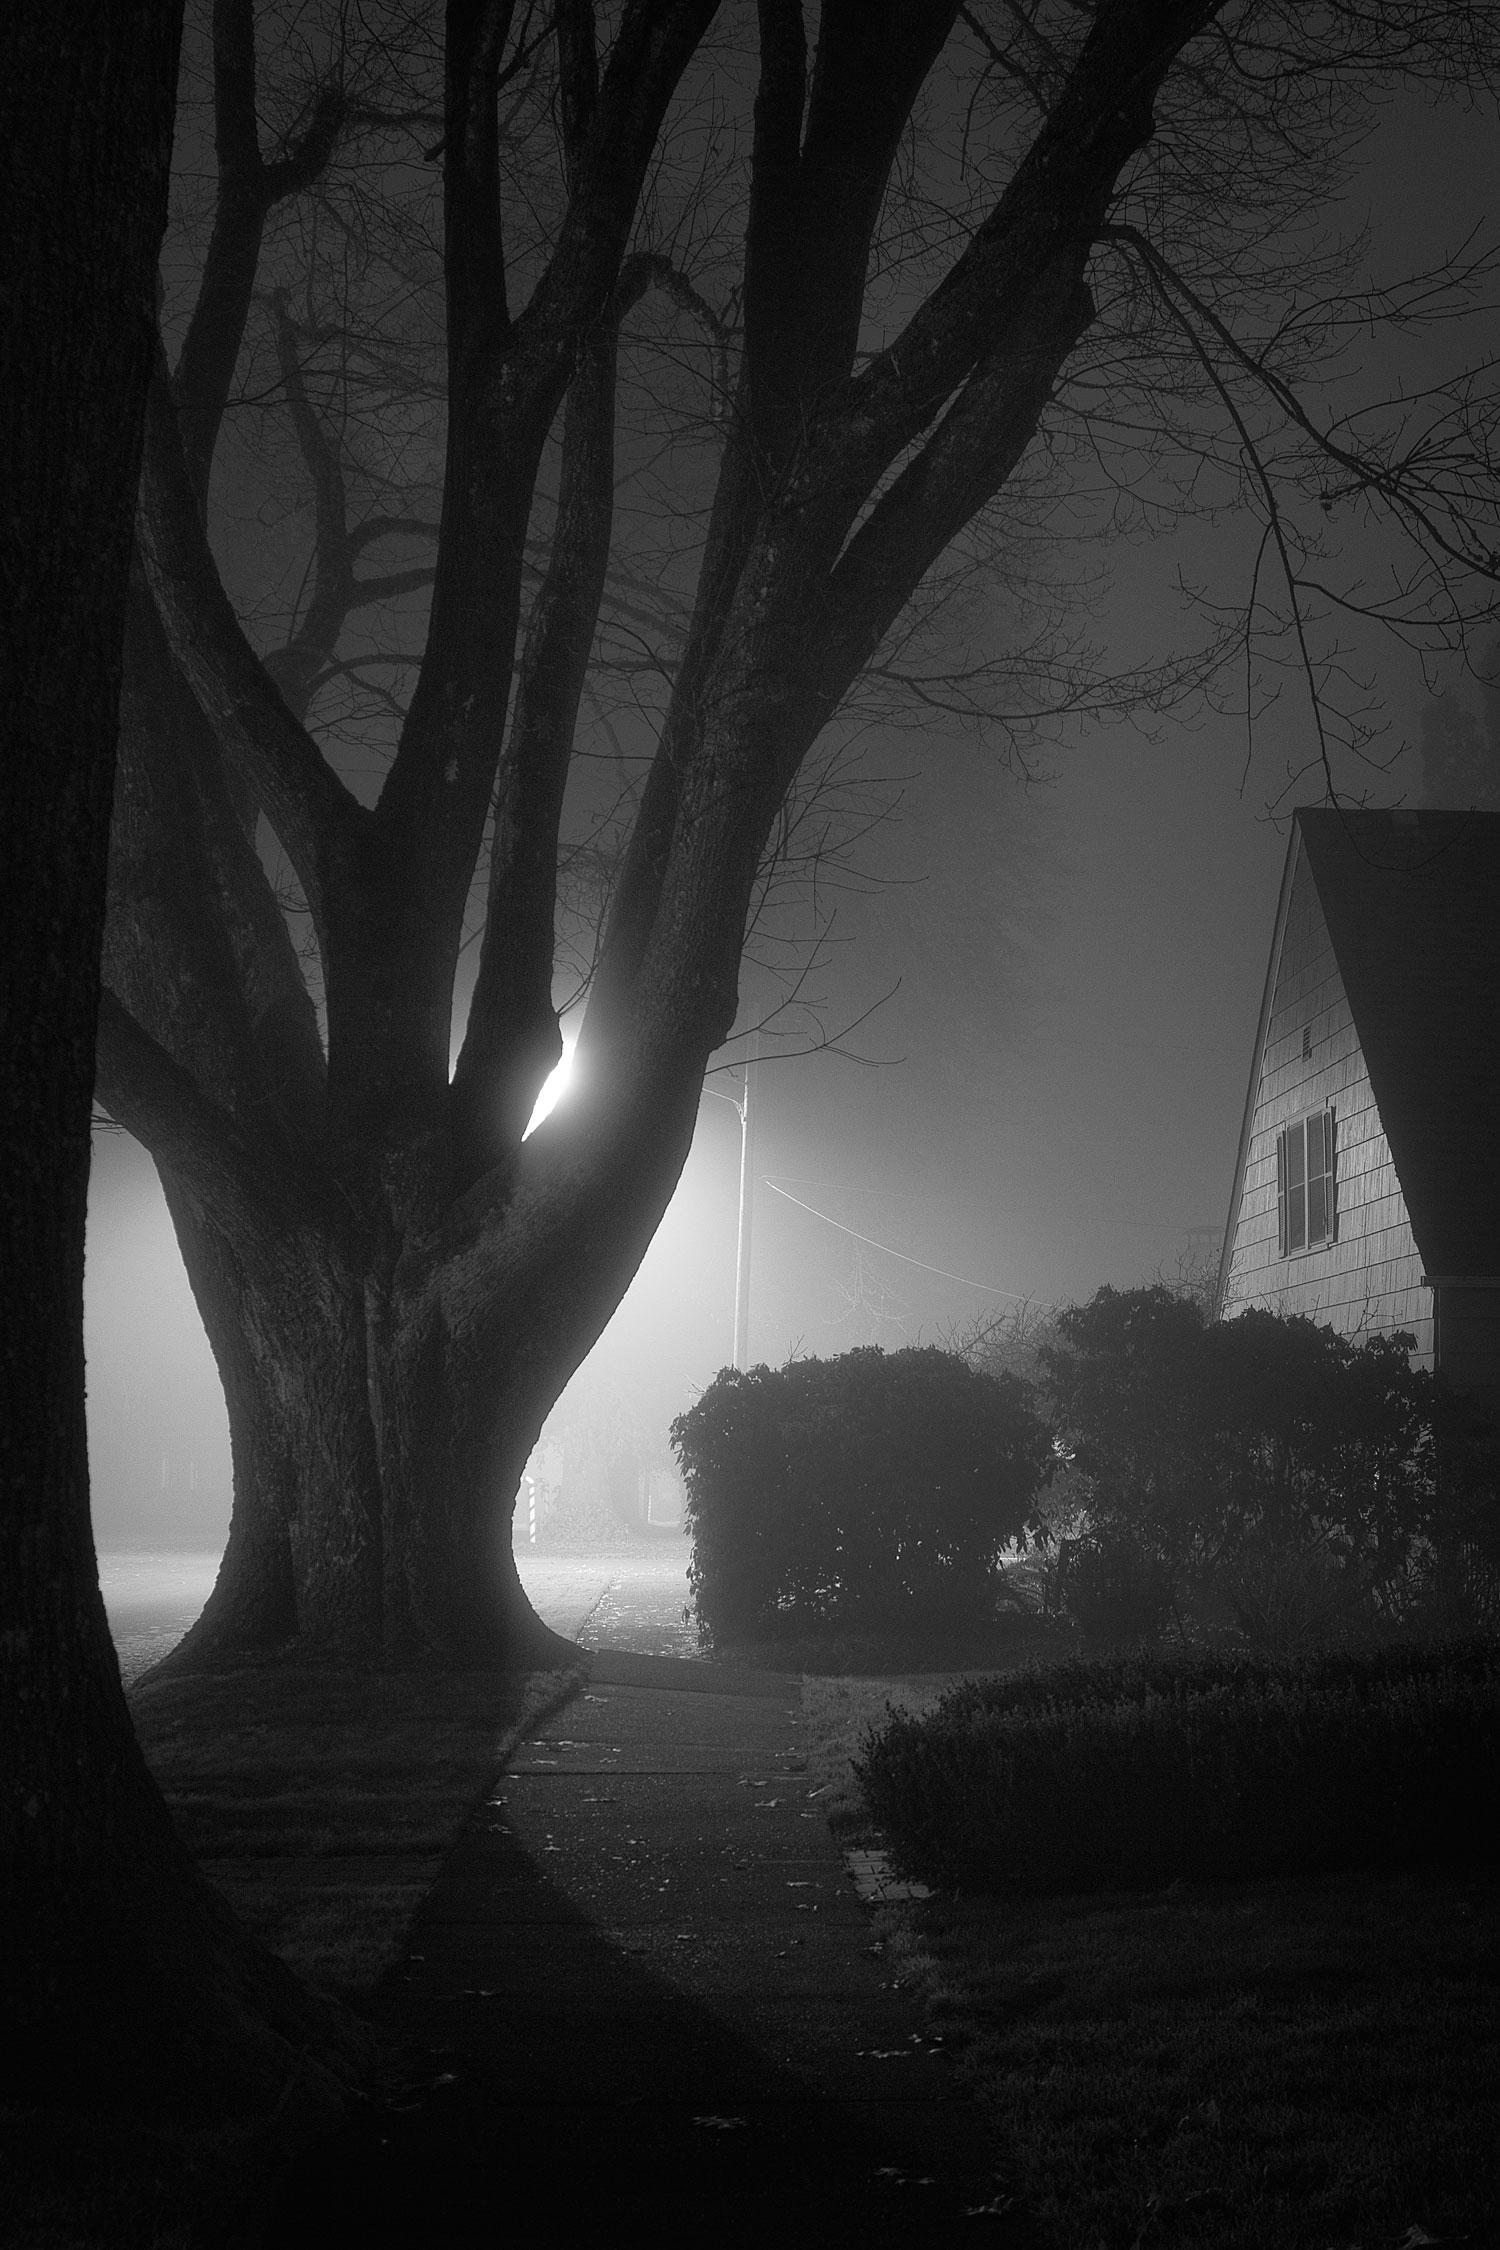 Fog Bow Tree